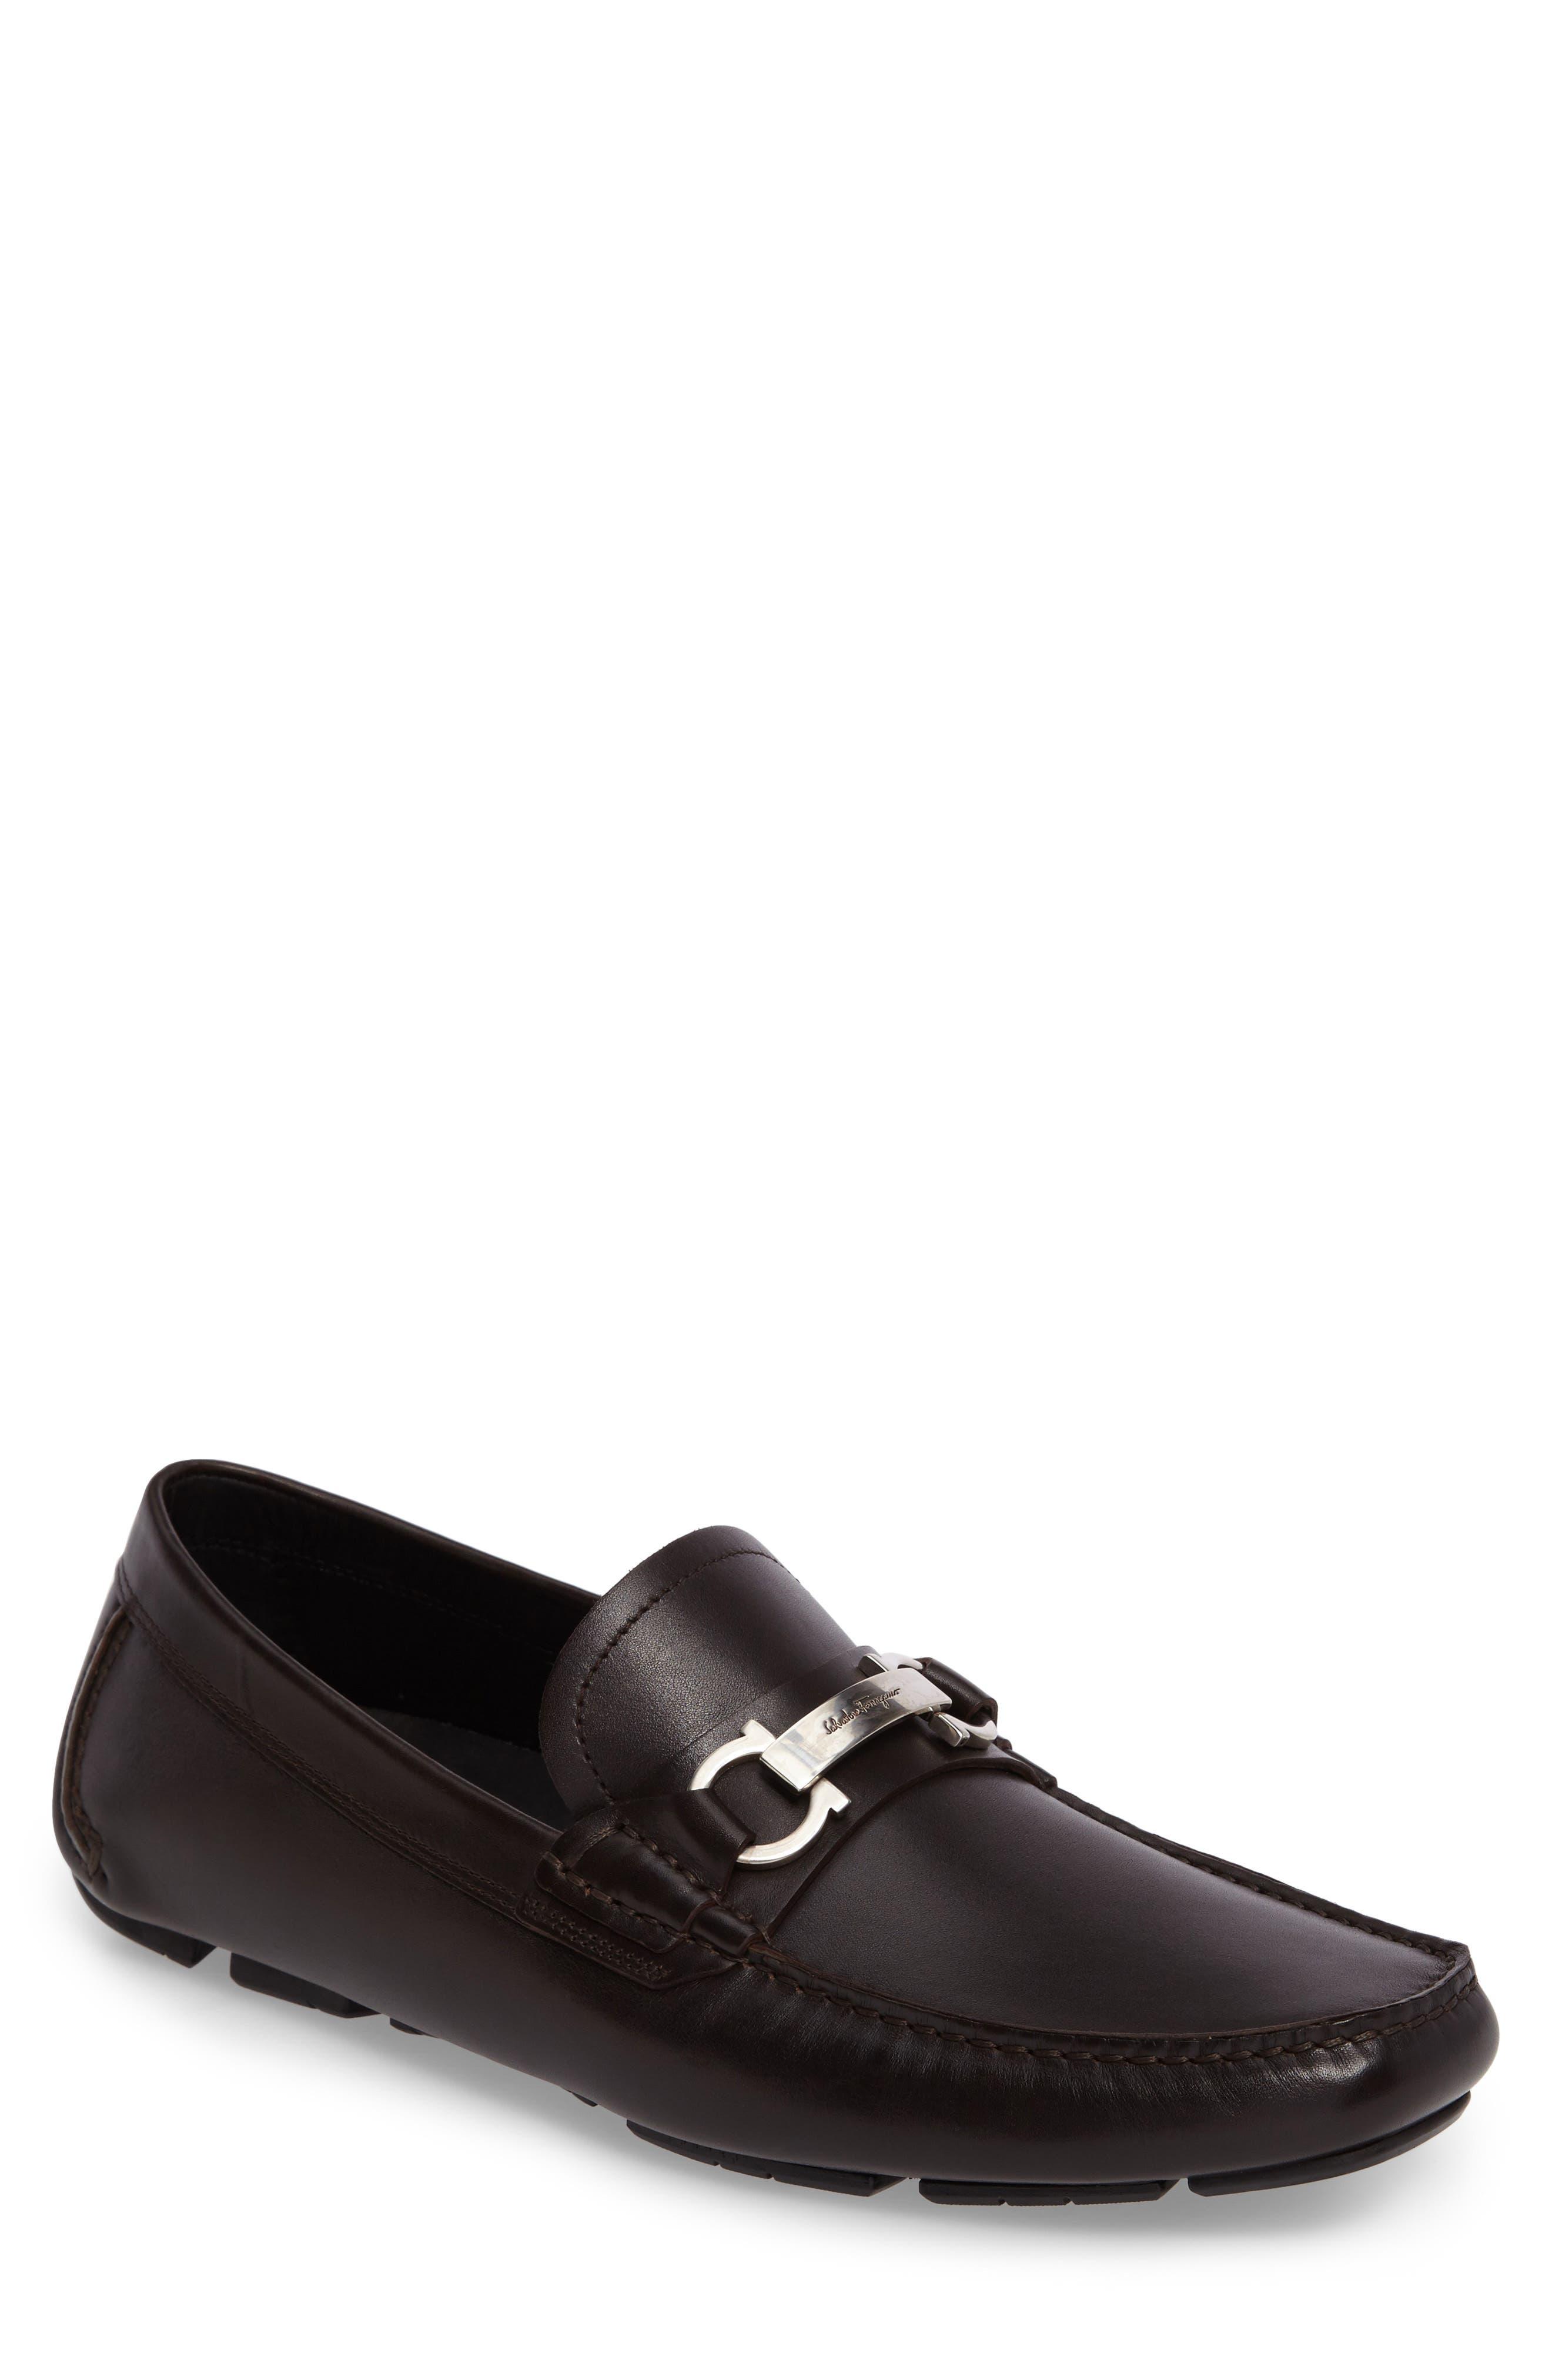 Salvatore Ferragamo Danubio Bit Driving Shoe (Men)